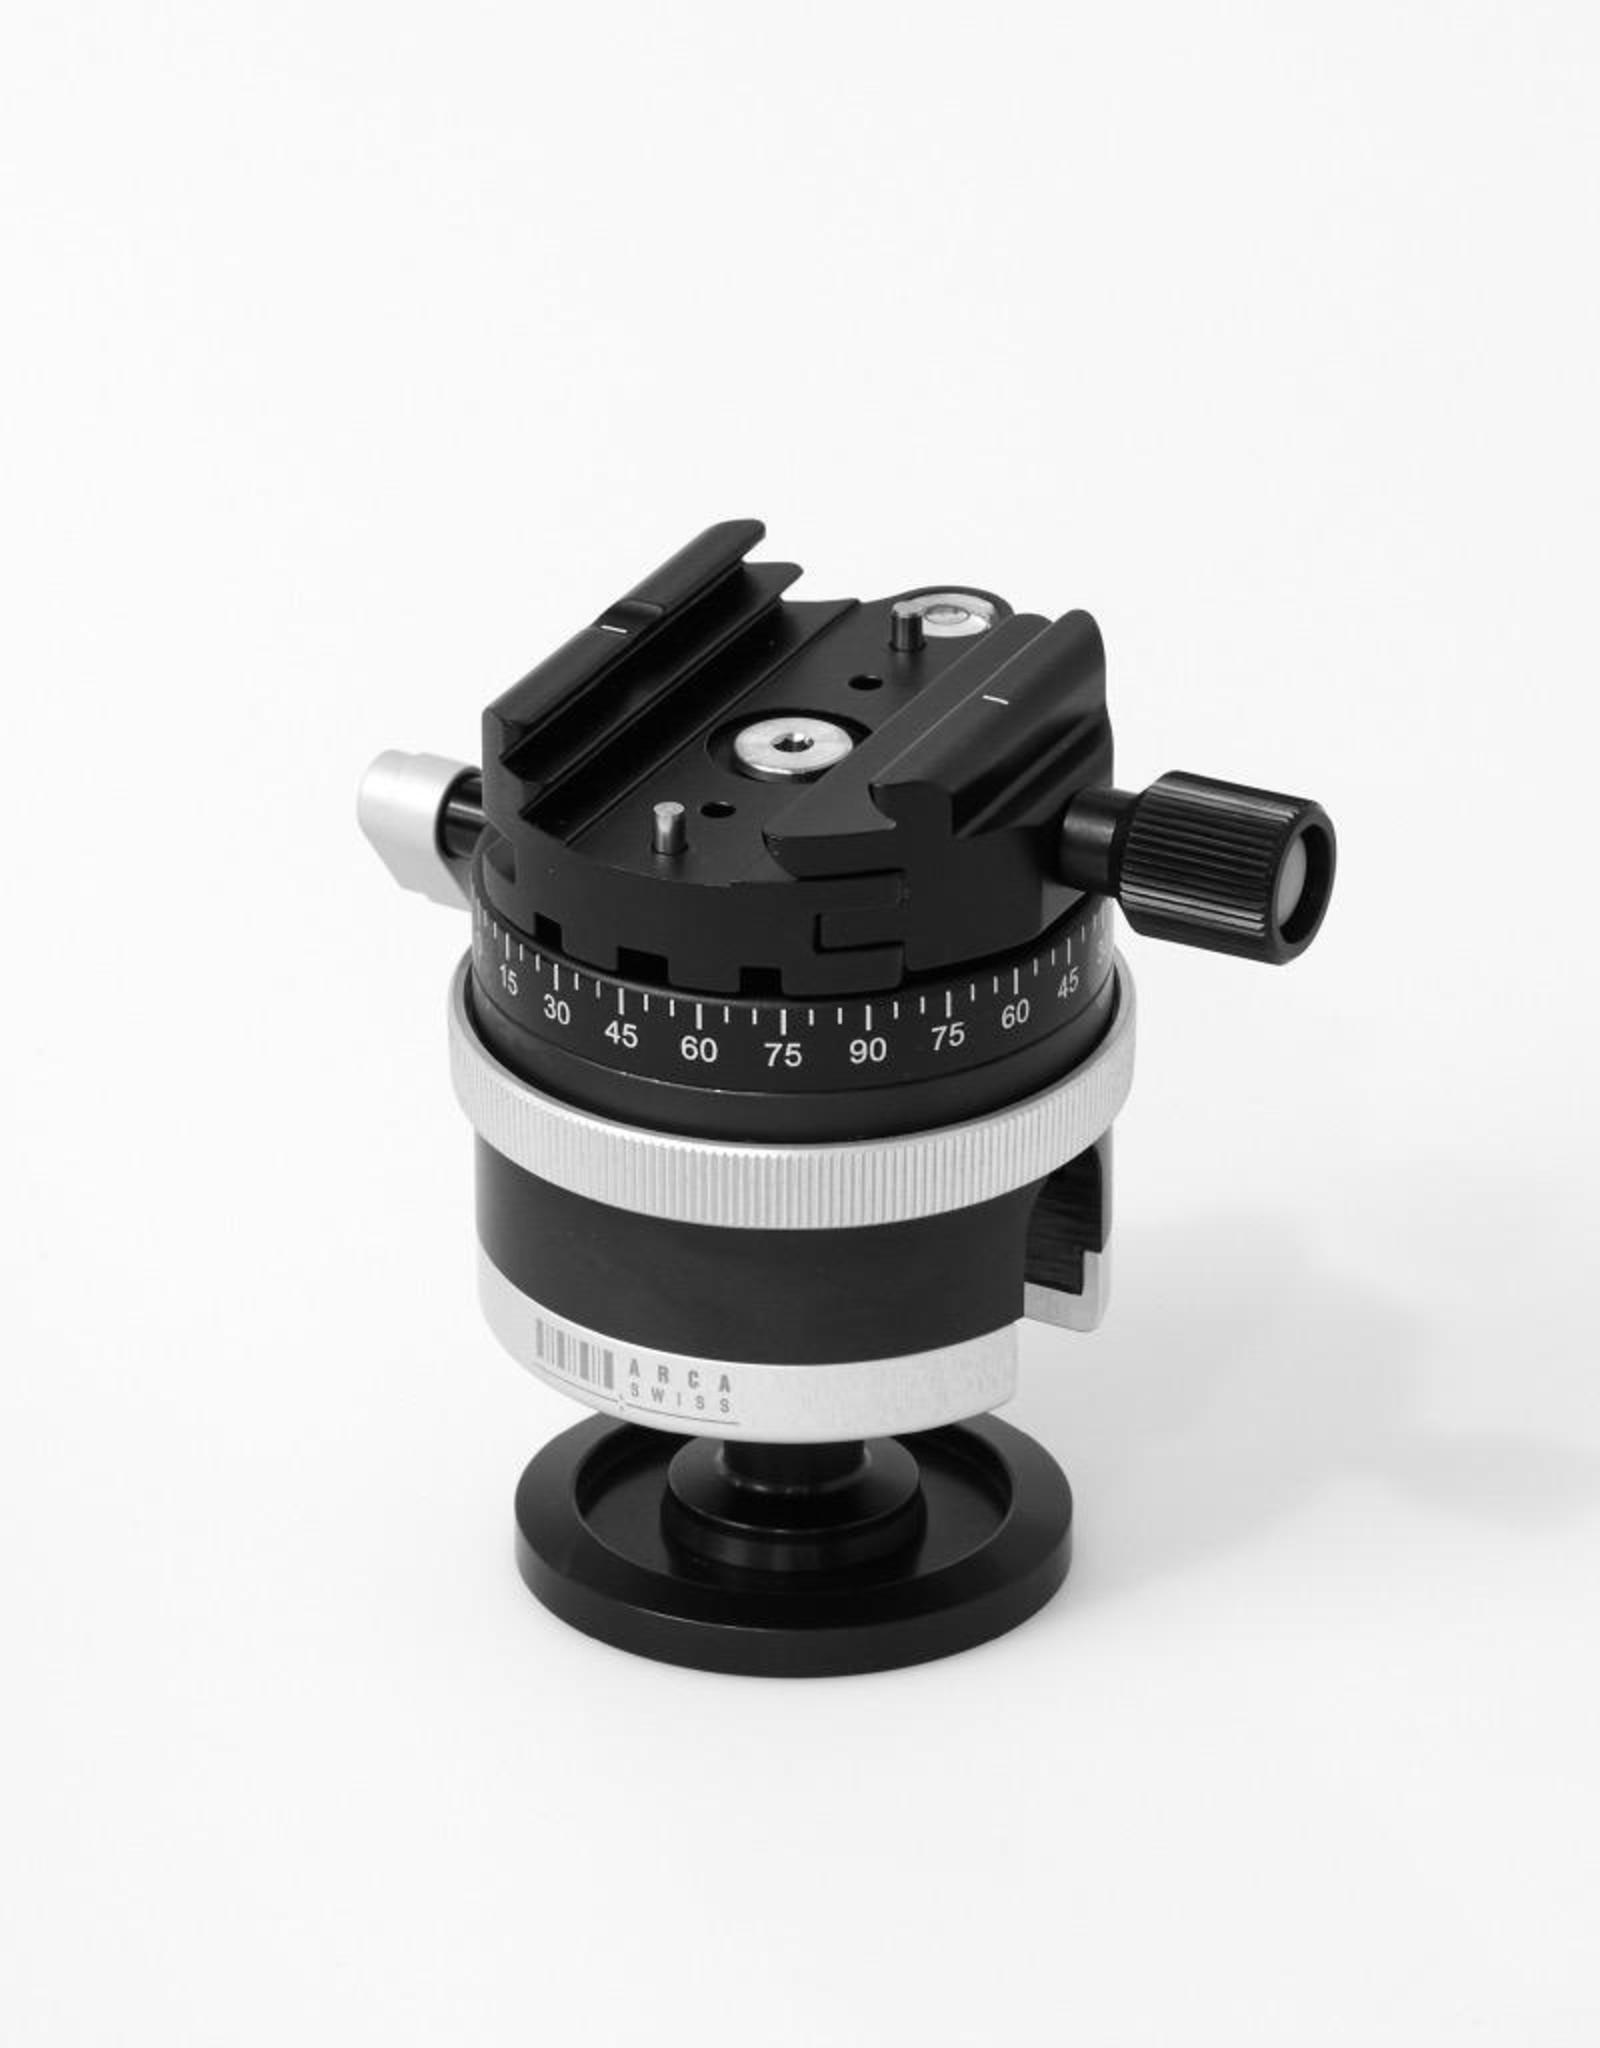 Arca Swiss ARCA-SWISS Monoball p0 with quick set device Classic